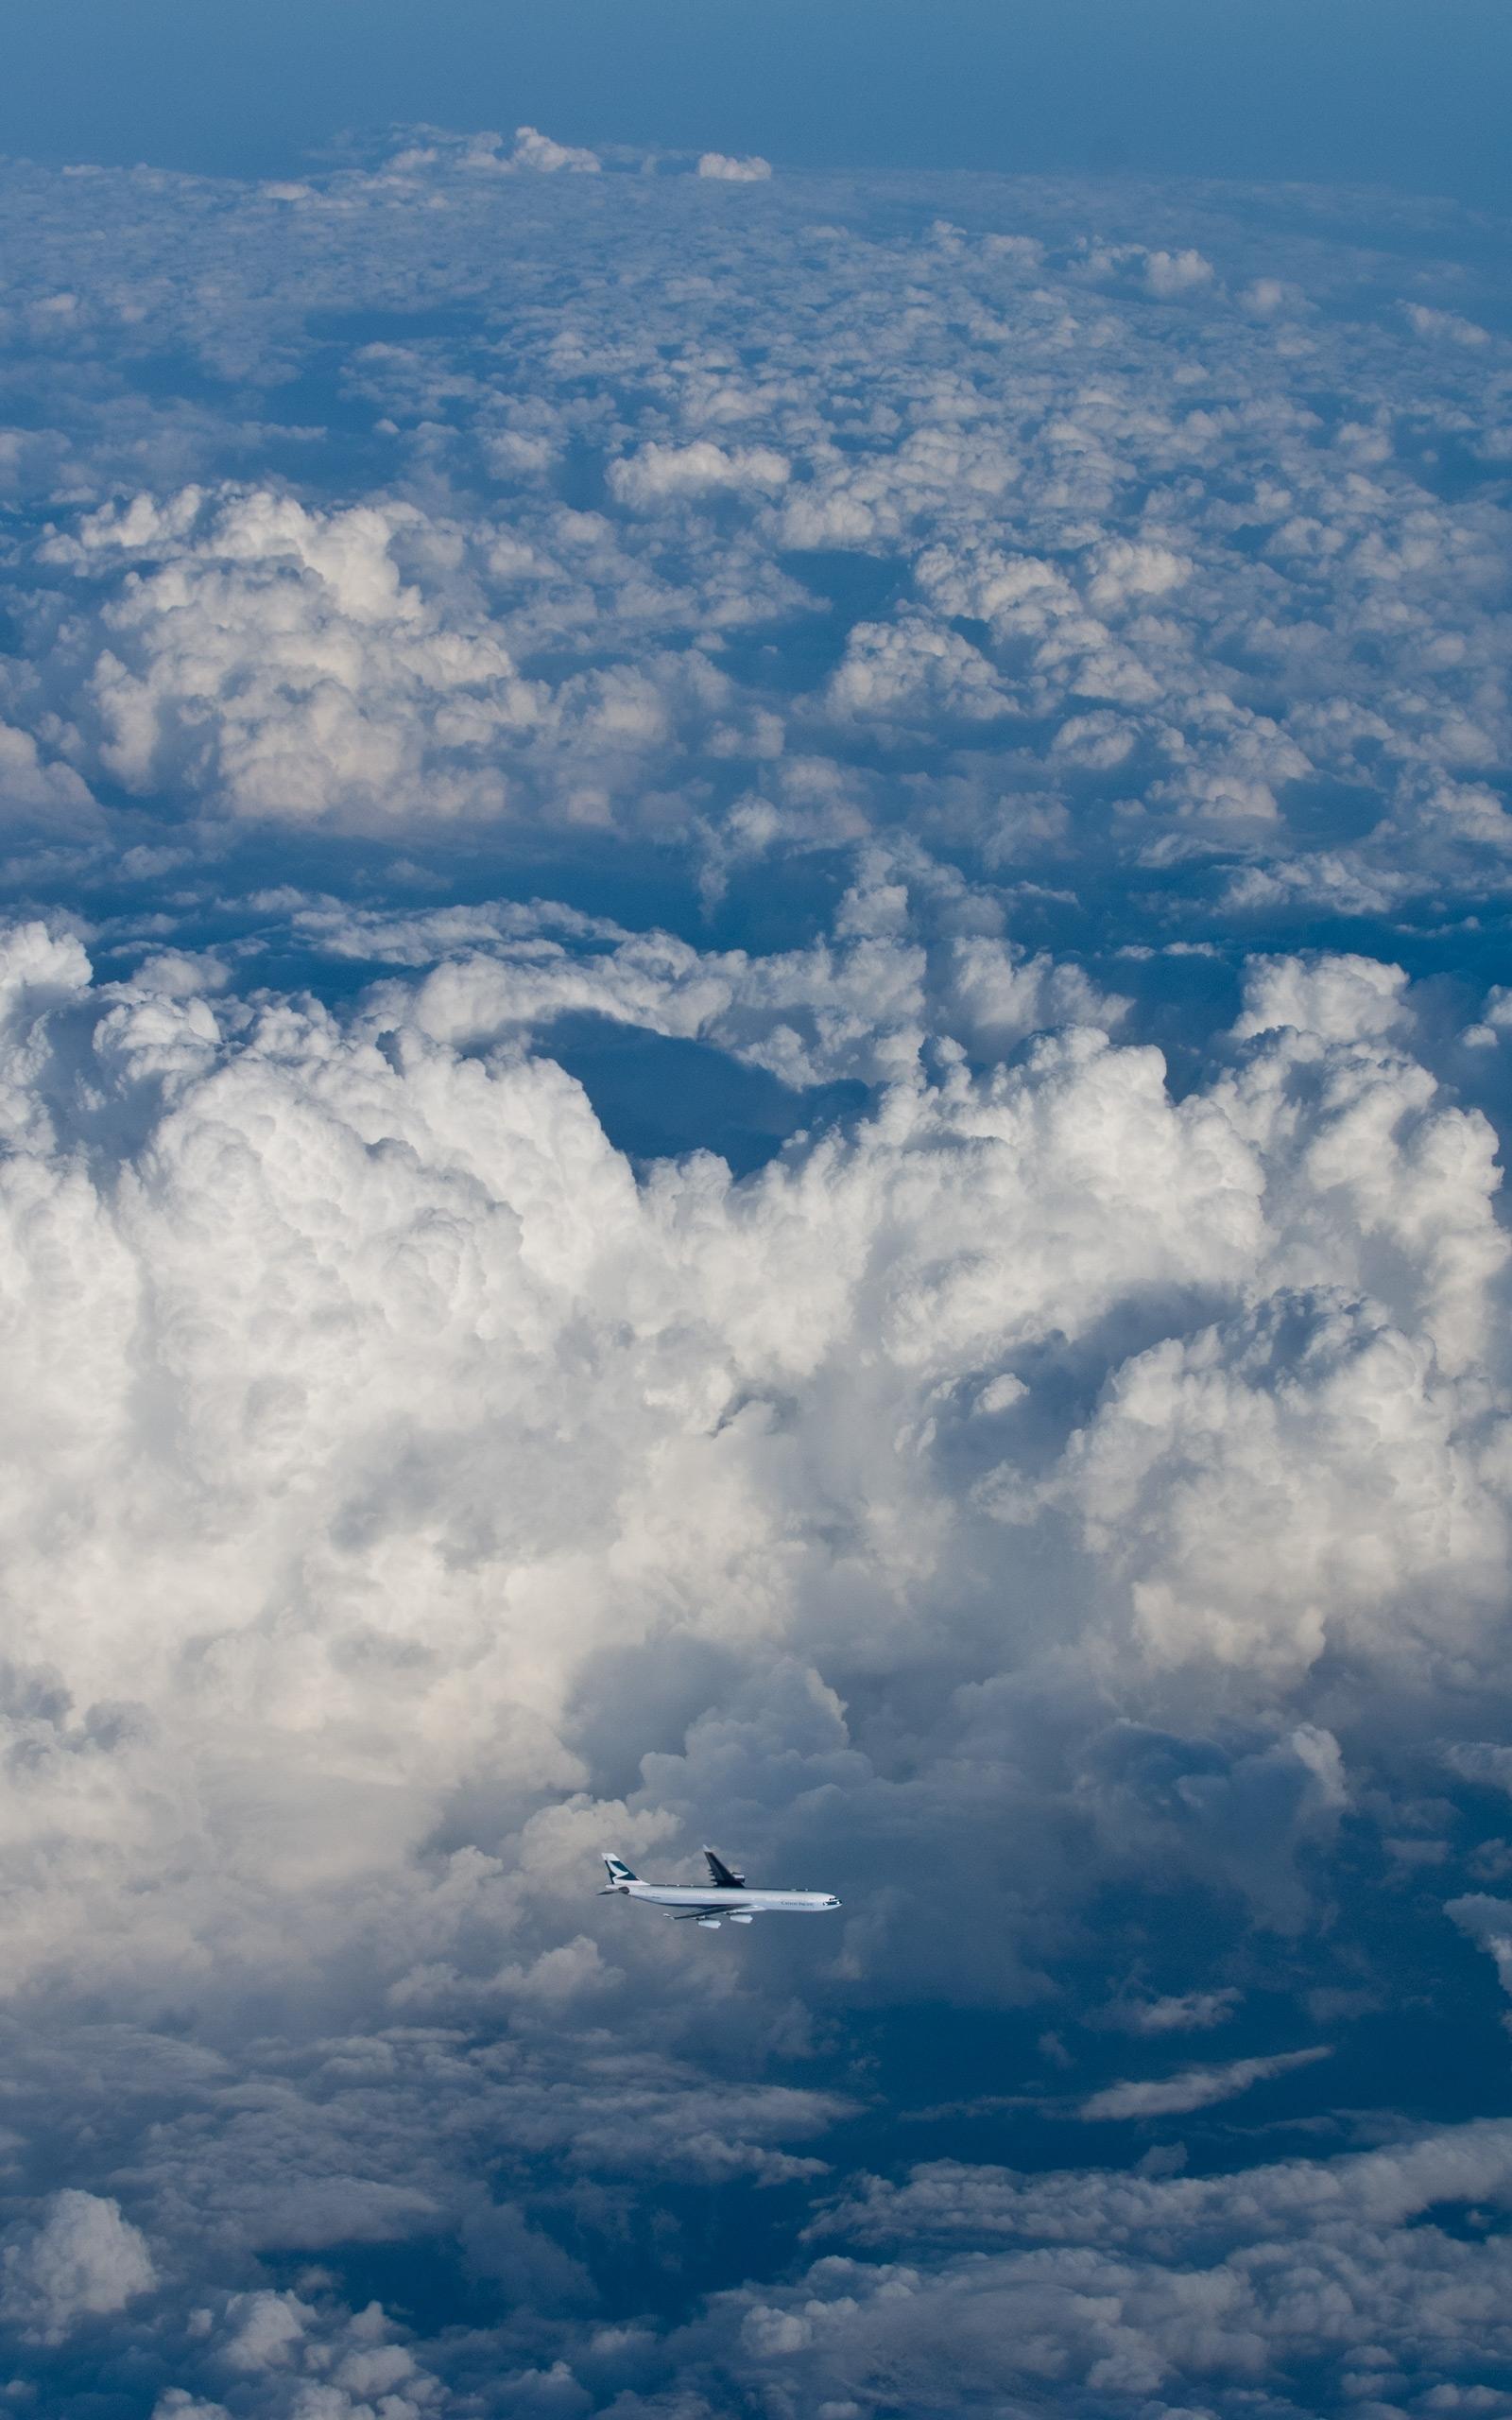 jeffrey friedl's blog » going vertical: portrait-mode desktop